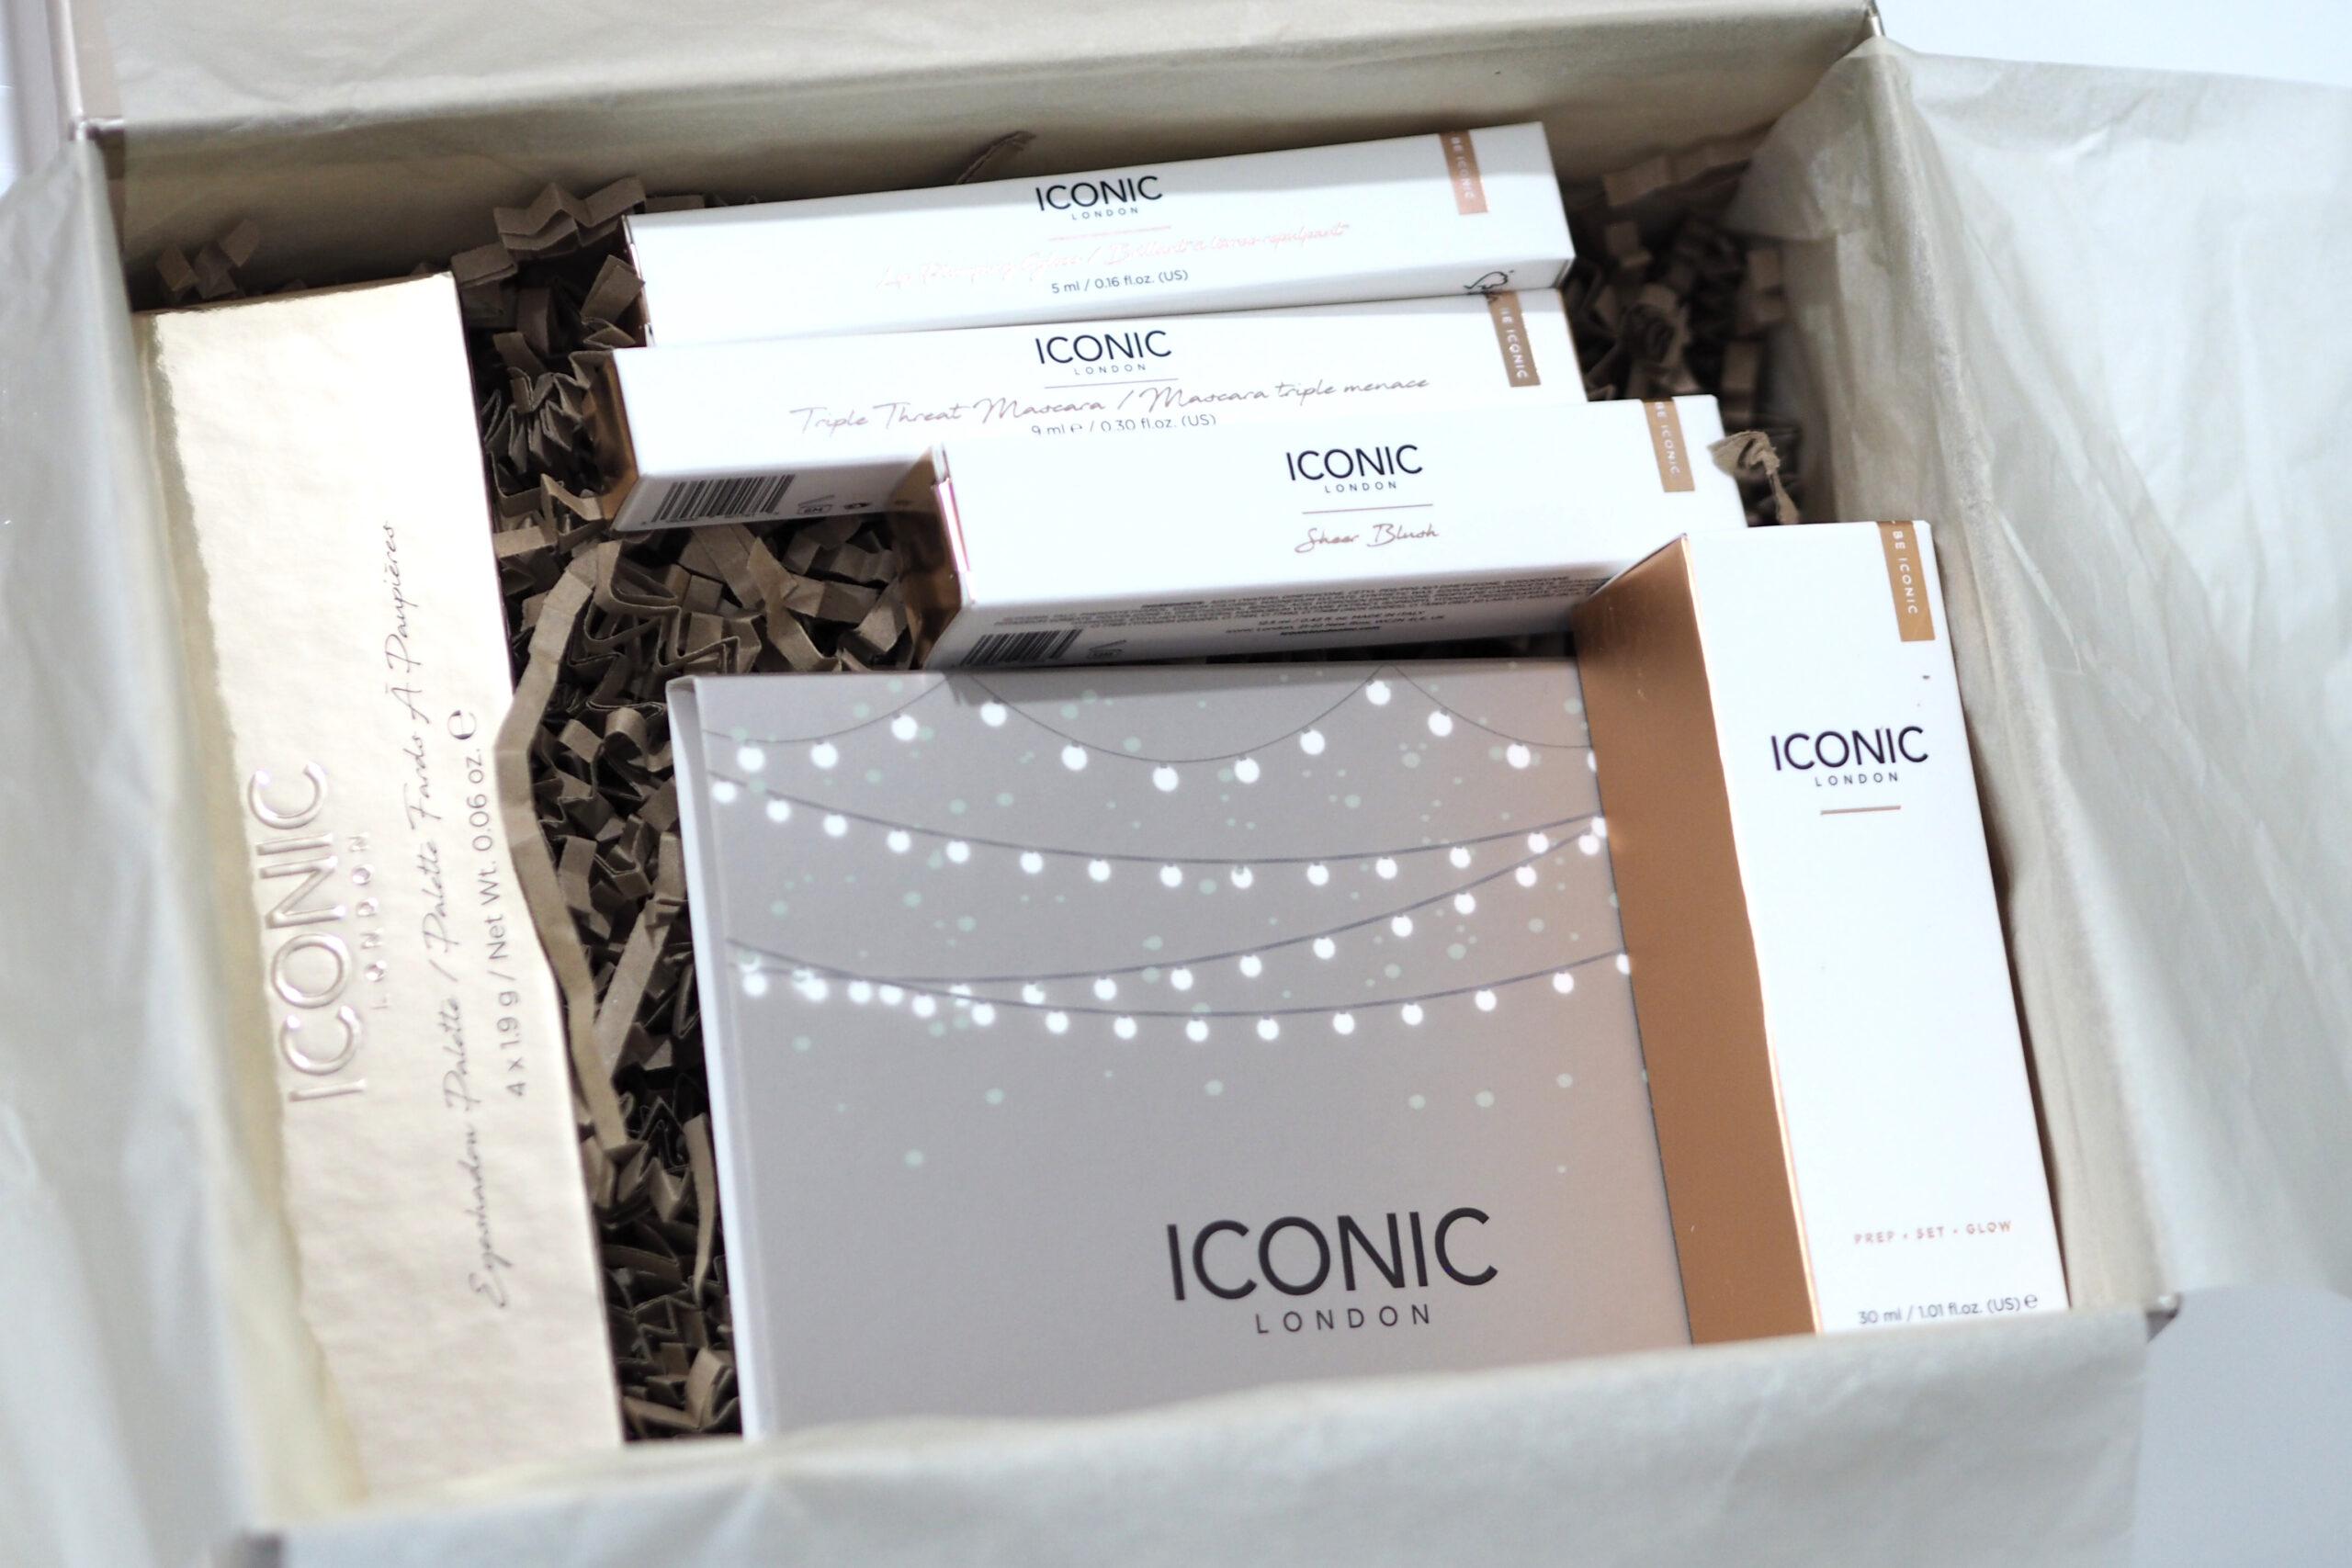 Lookfantastic x Iconic London Beauty Box Reveal!